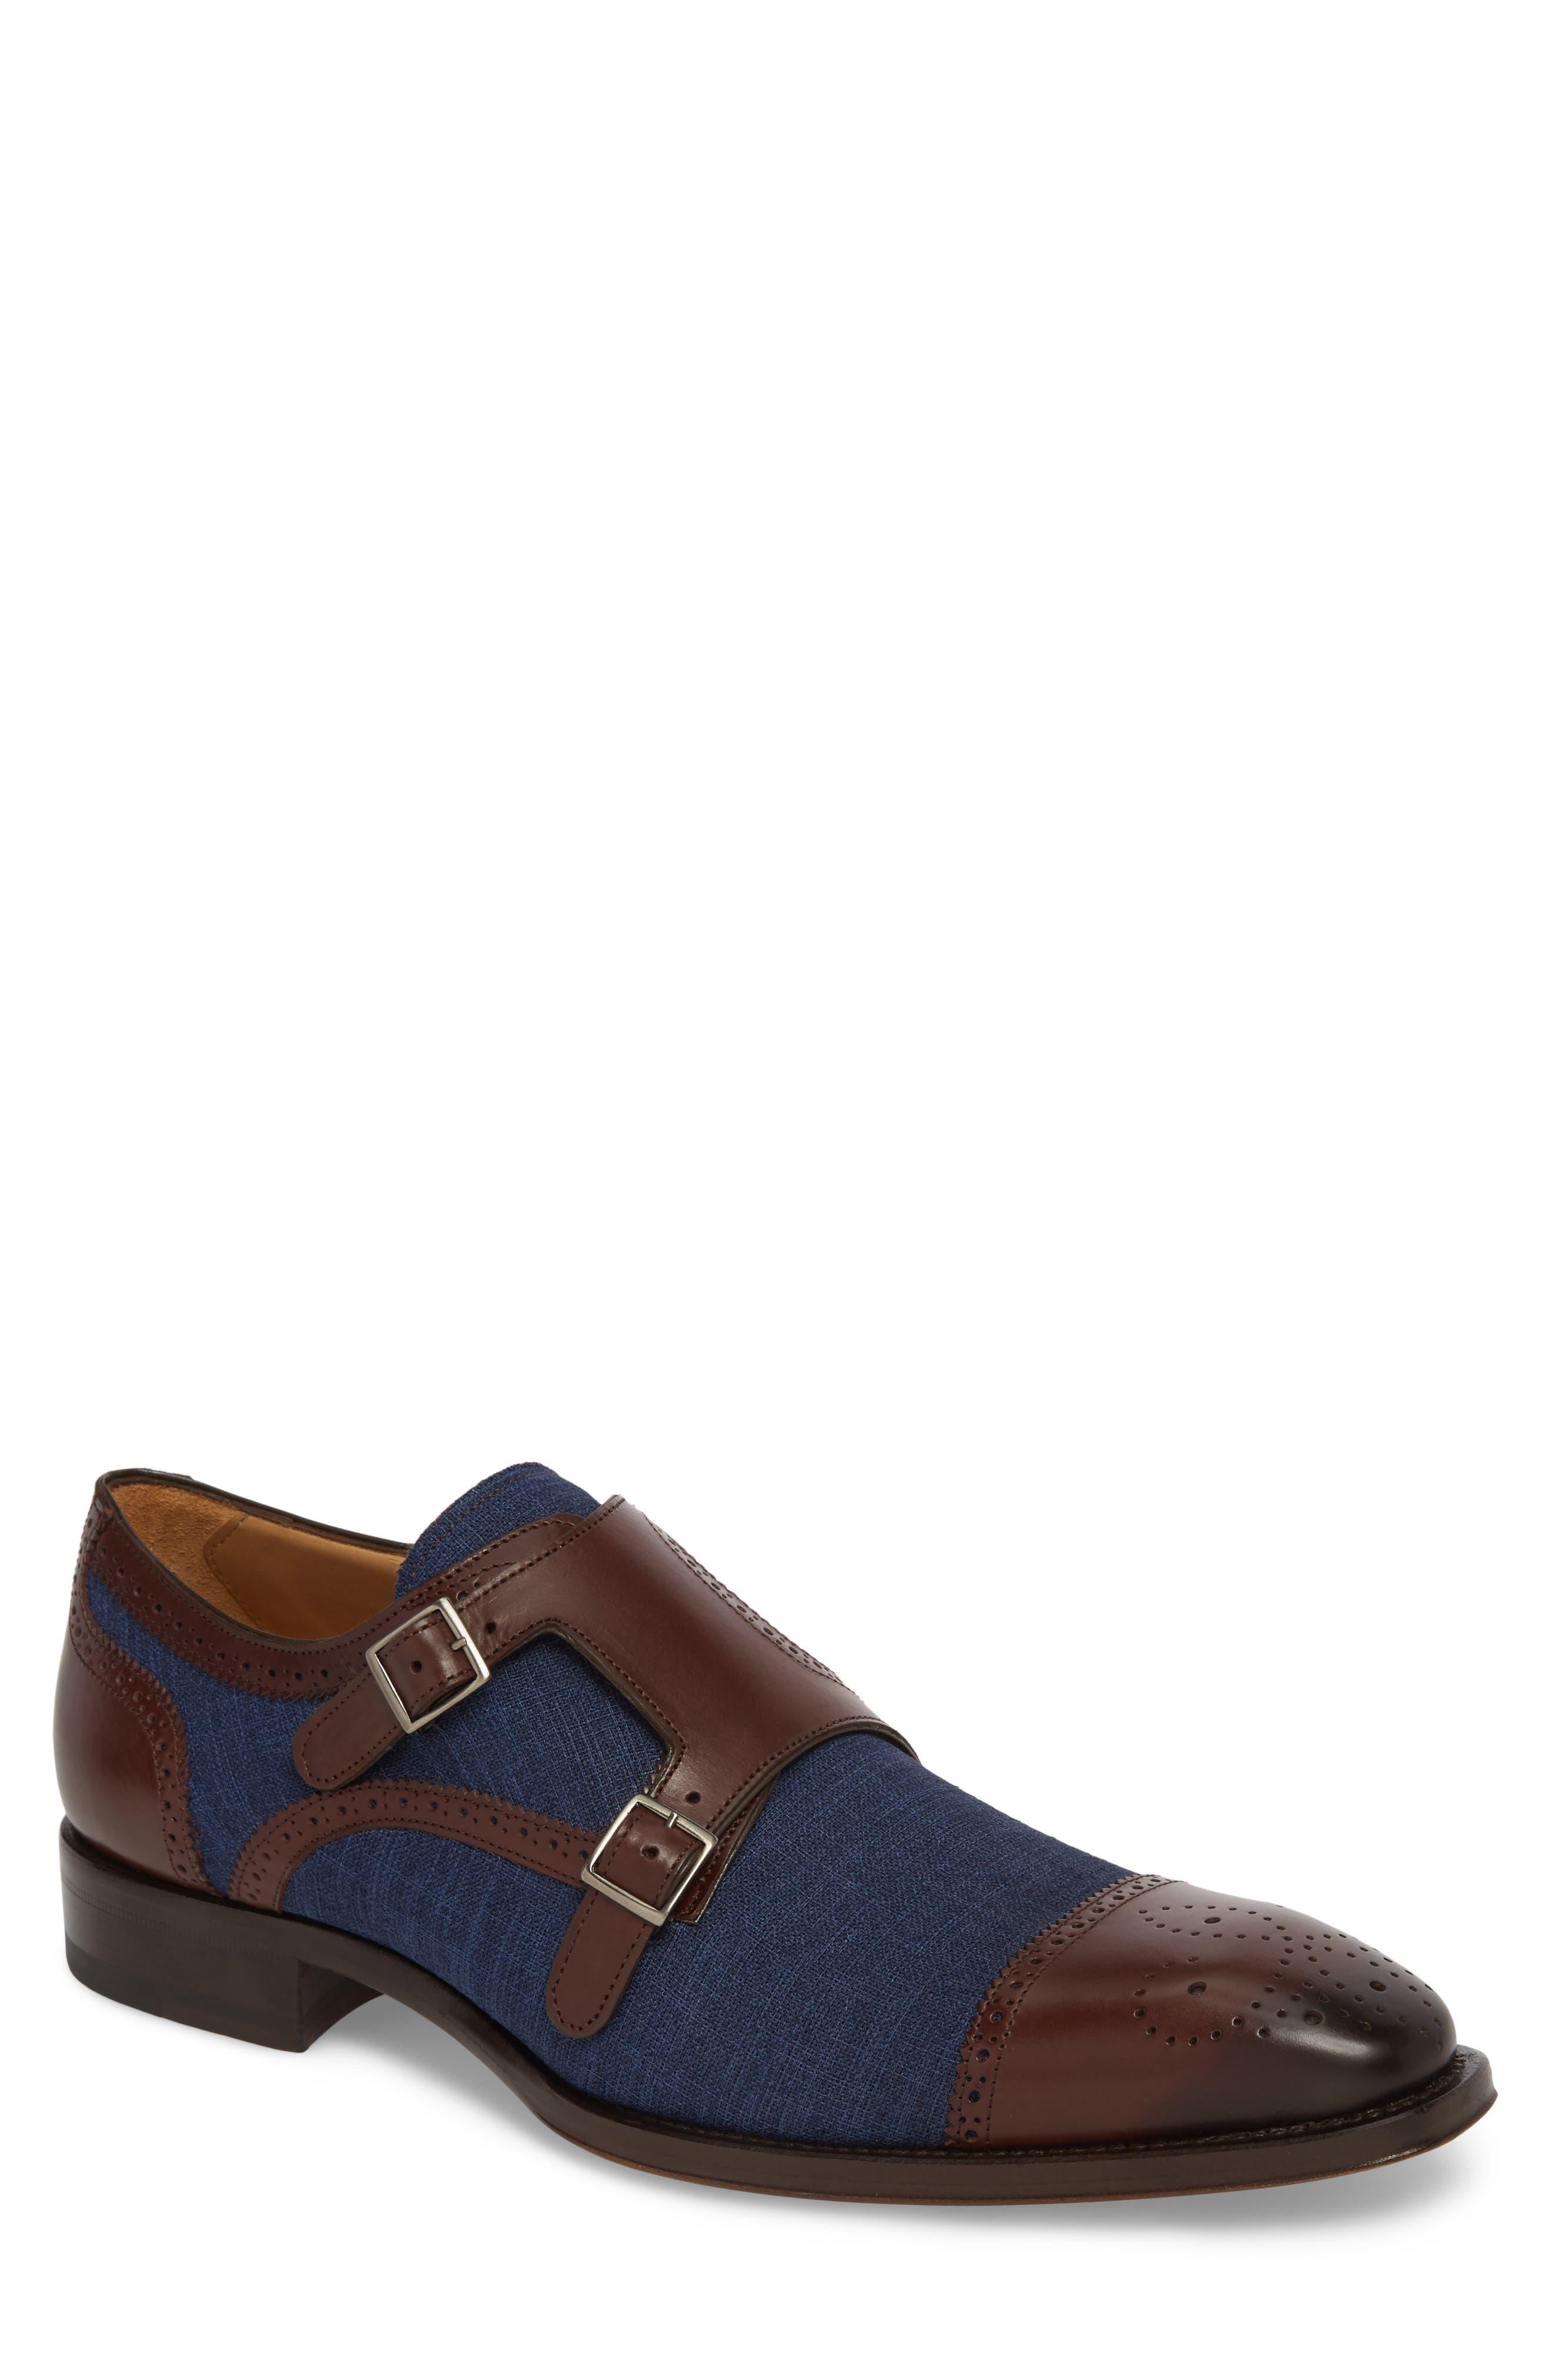 Cupido Double Monk Strap Cap Toe Shoe,                         Main,                         color, BROWN/ BLUE LEATHER